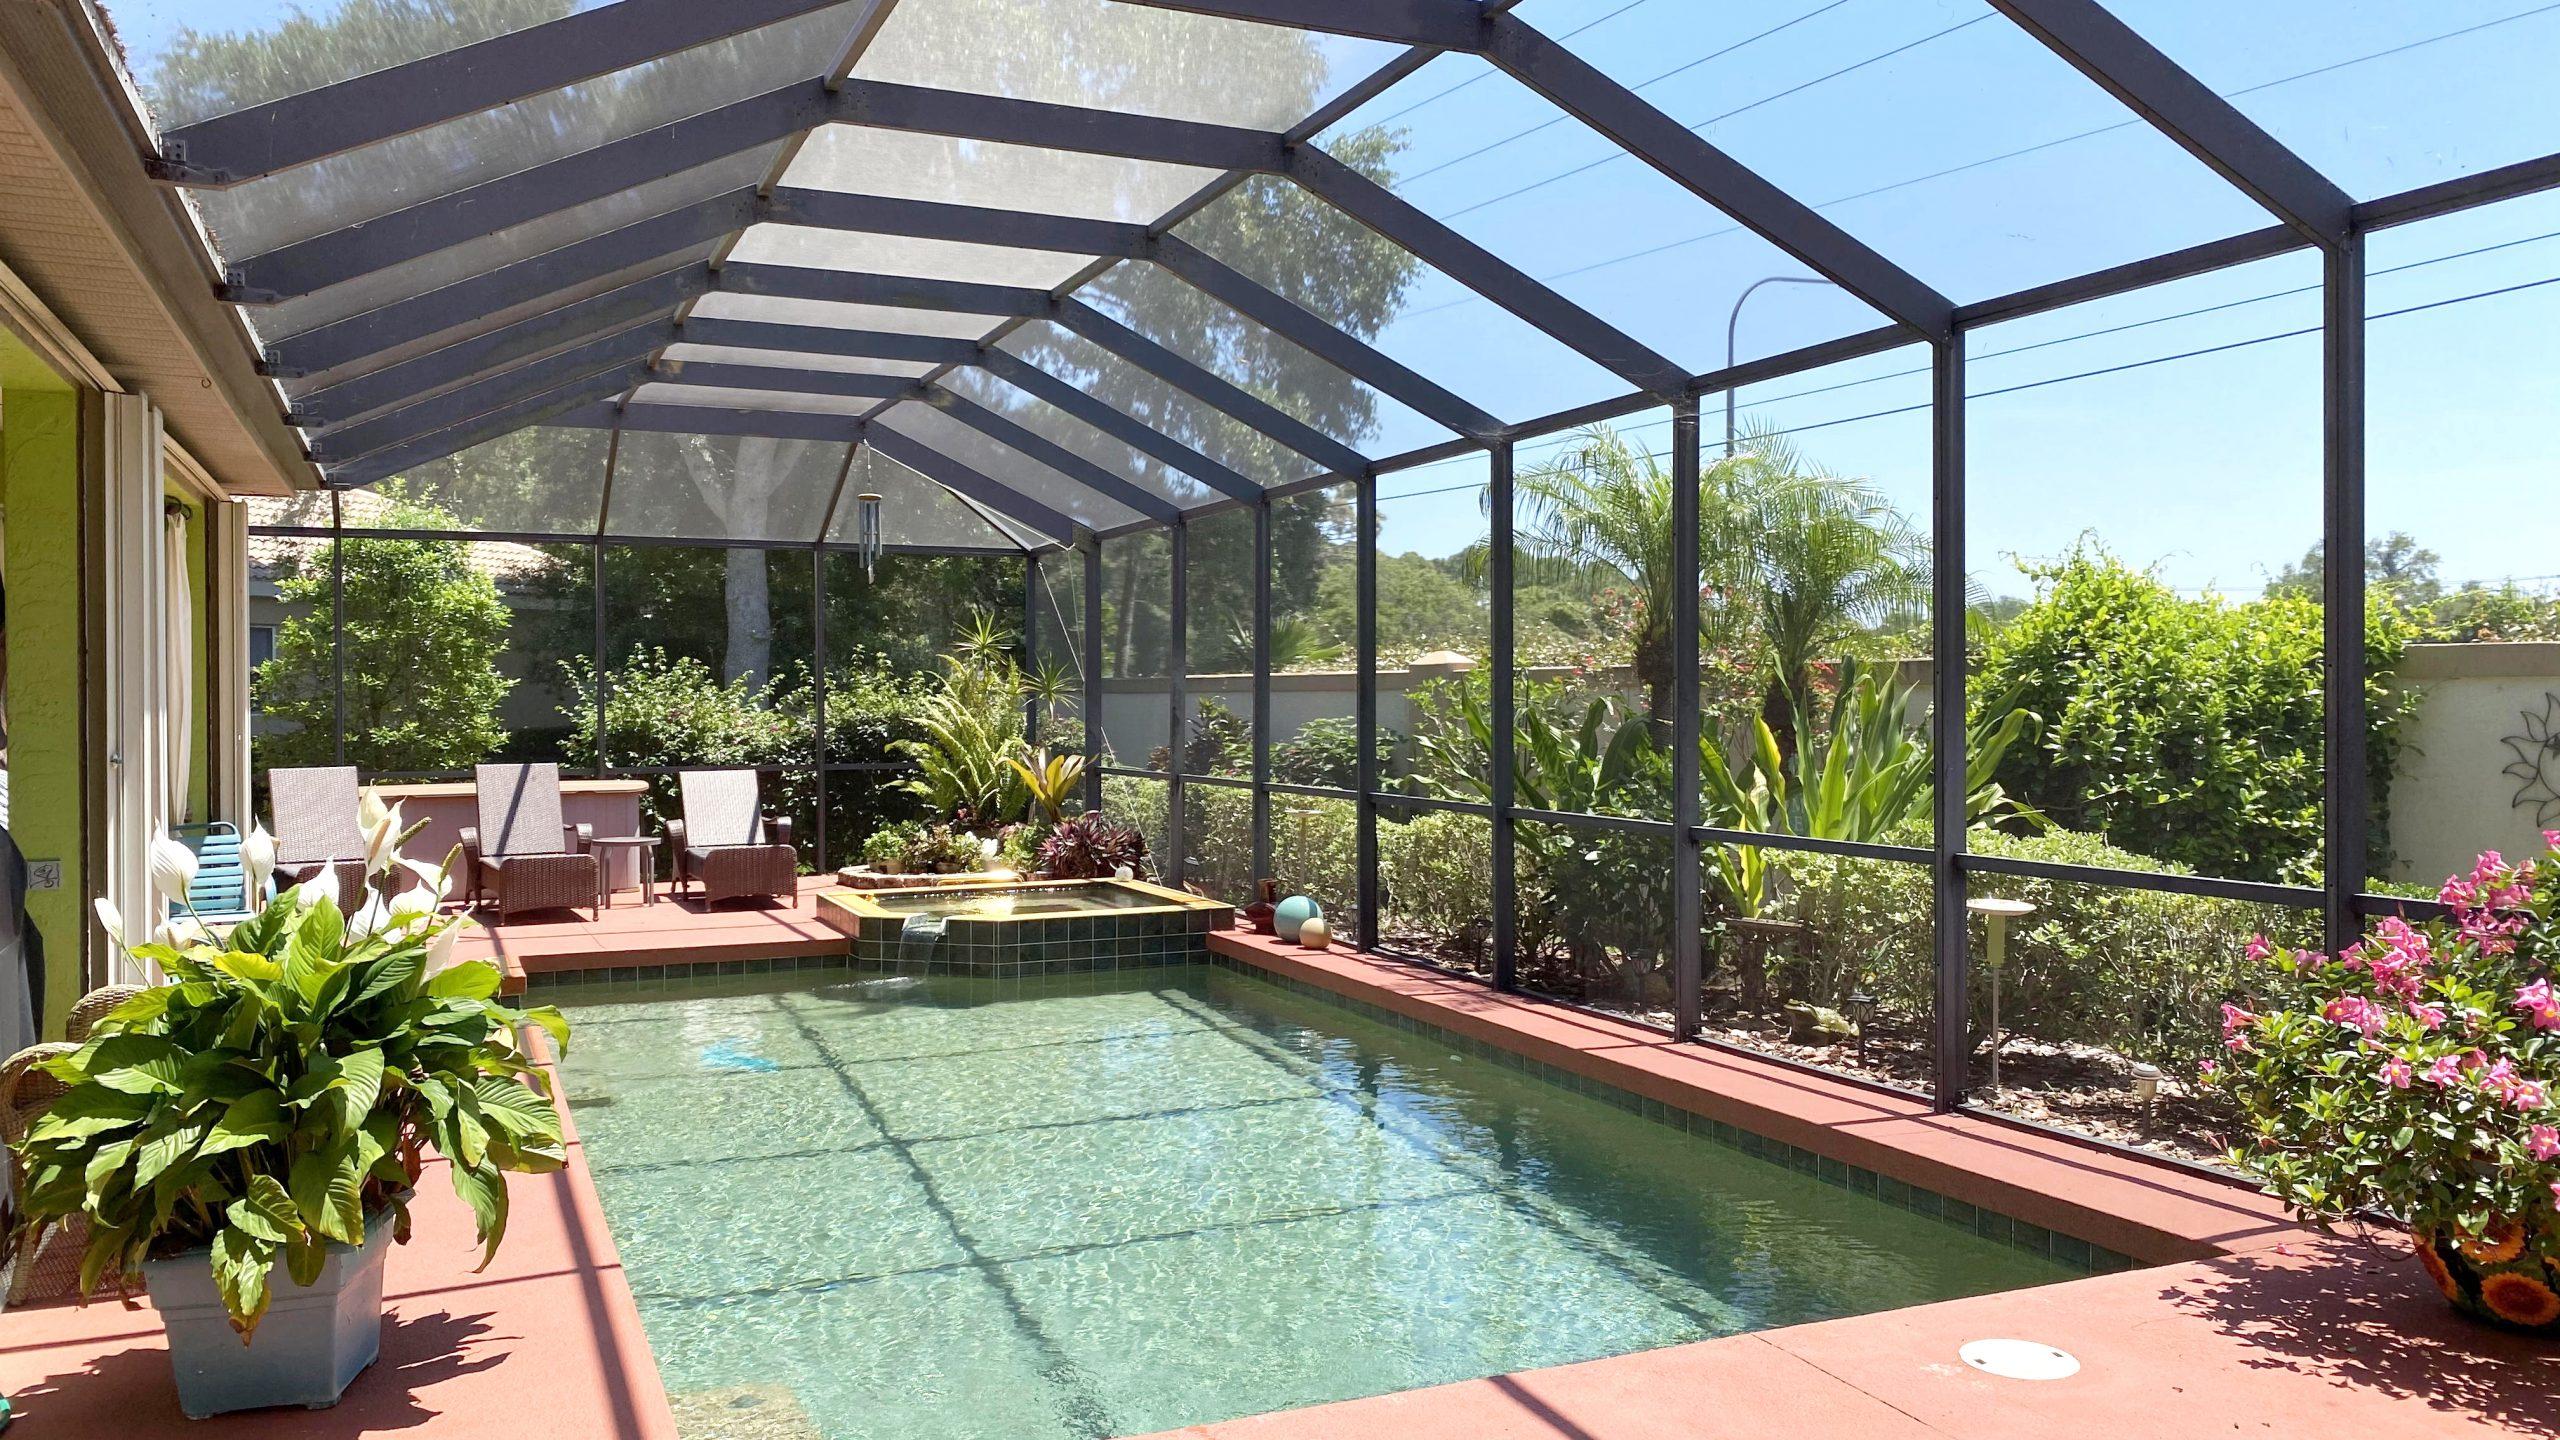 Pool home 107 wayforest venice florida.